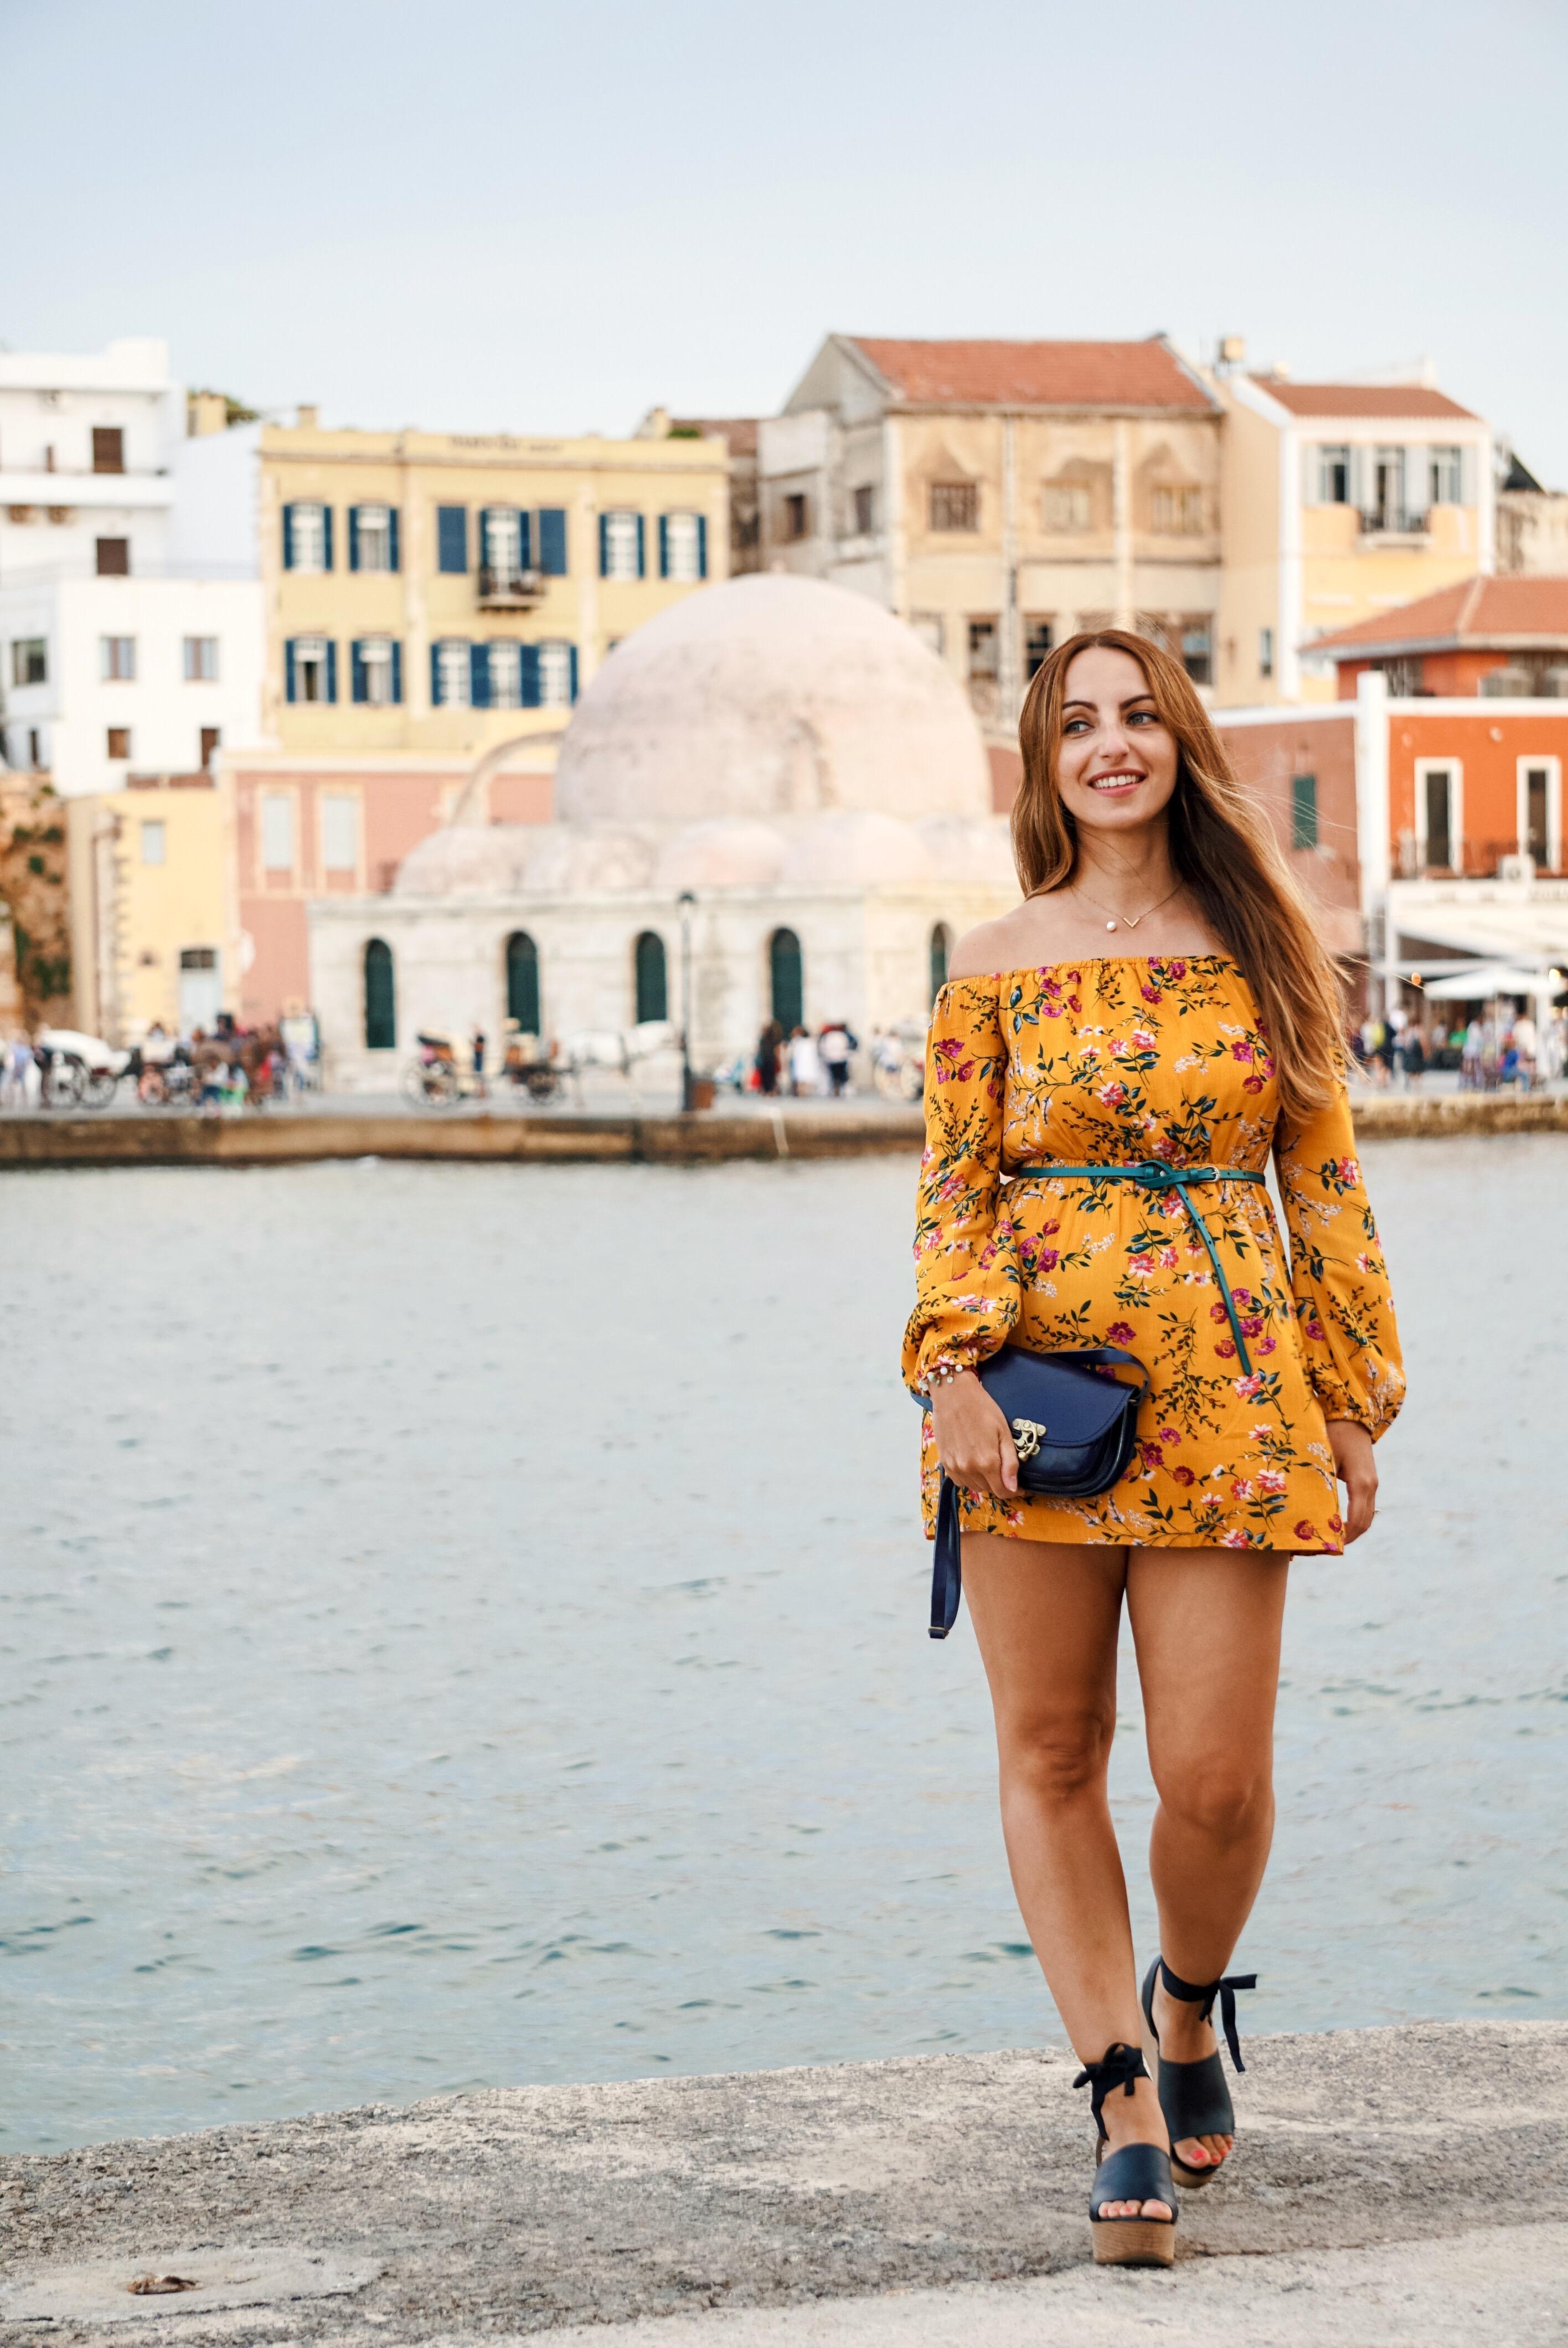 Chania-Crete-Fashionblogger-Outfit-Post-2